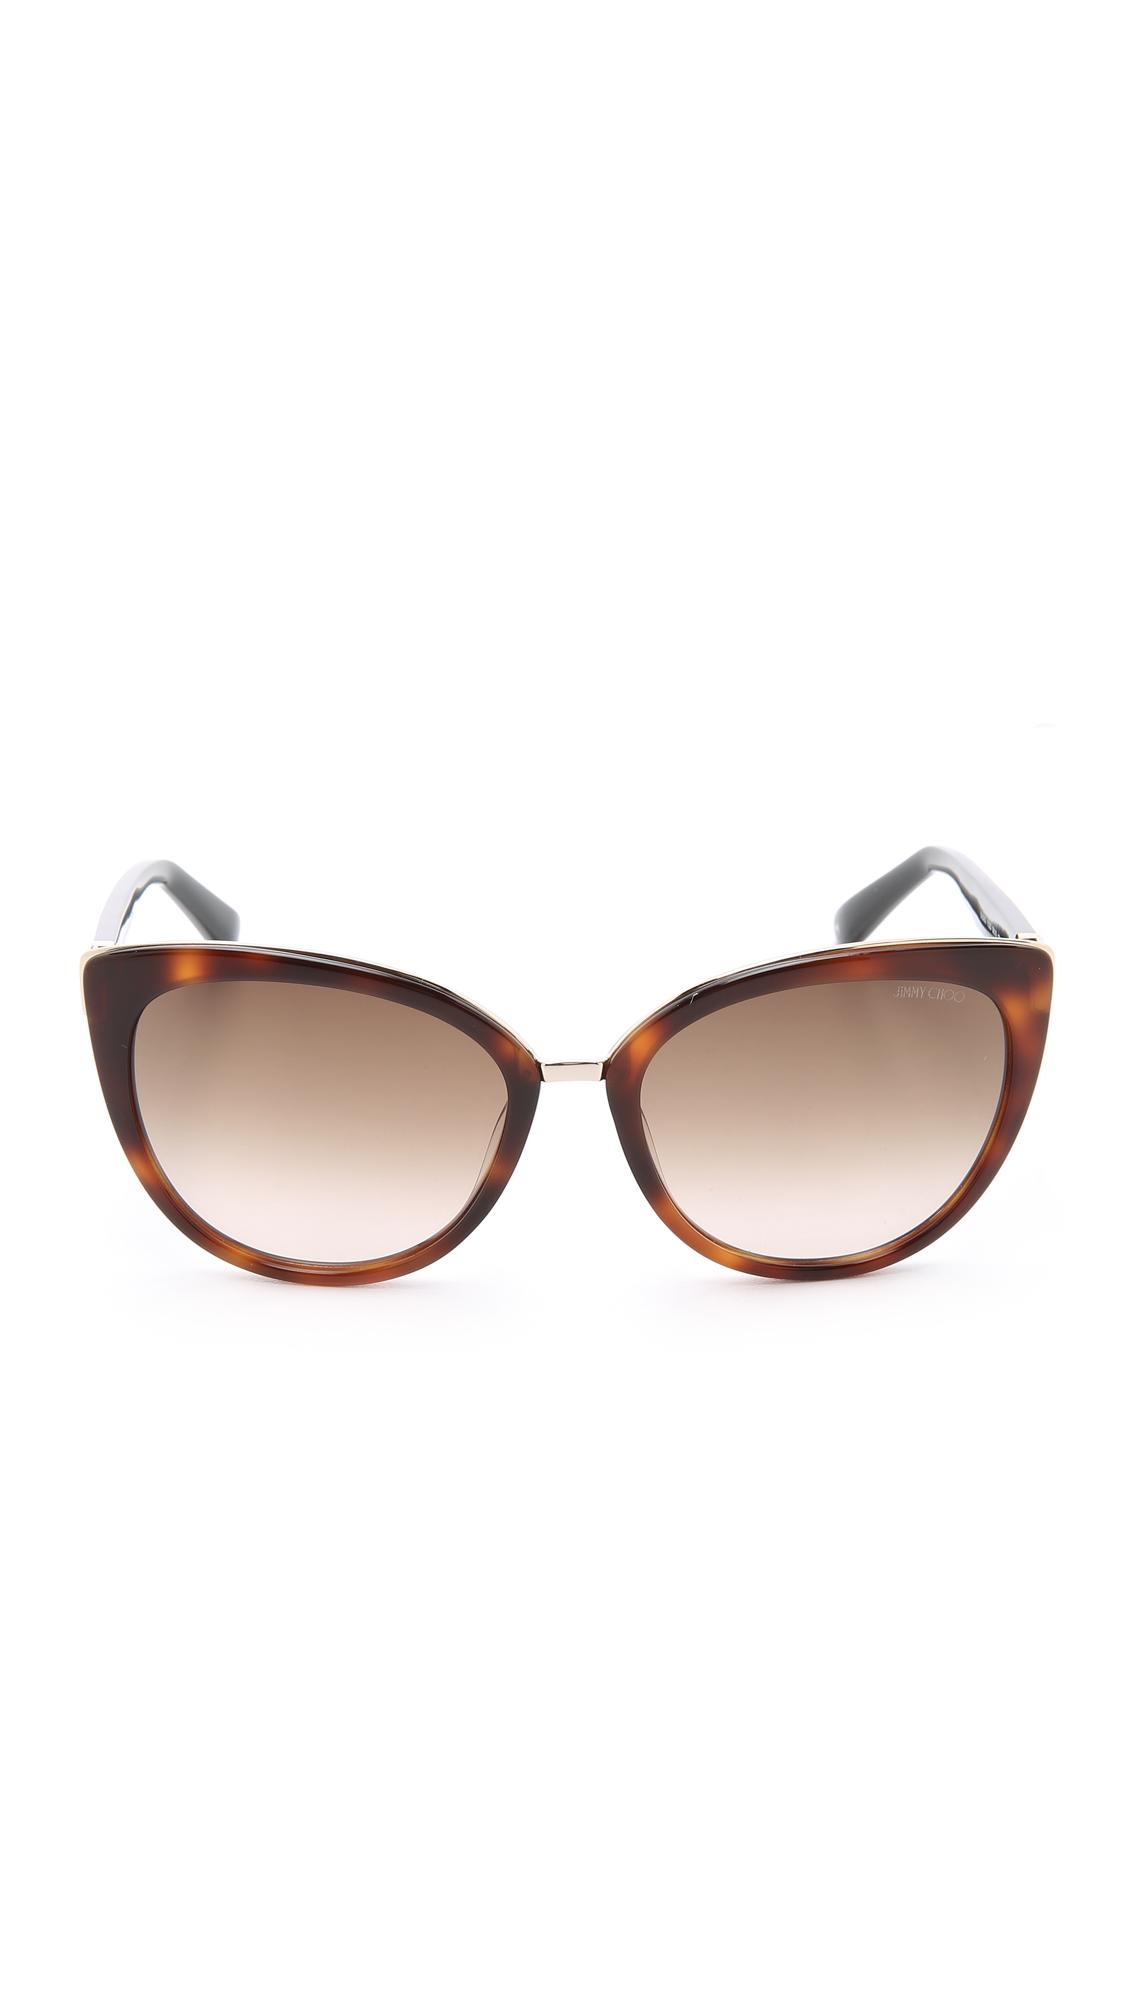 0151518babf Jimmy Choo Dana Sunglasses in Brown - Lyst